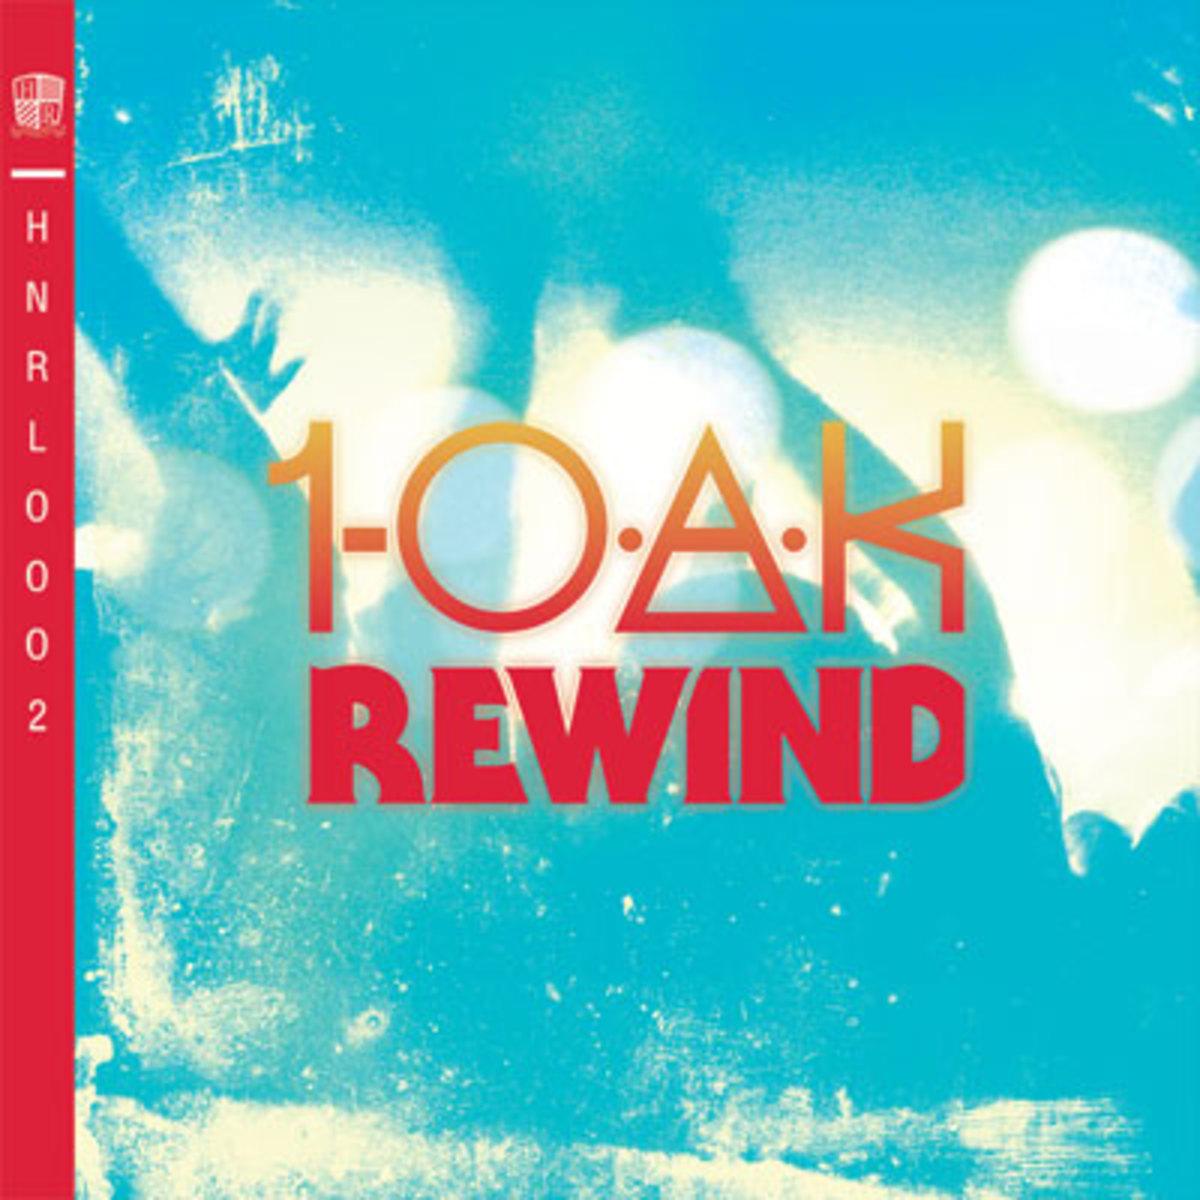 1oak-rewind.jpg